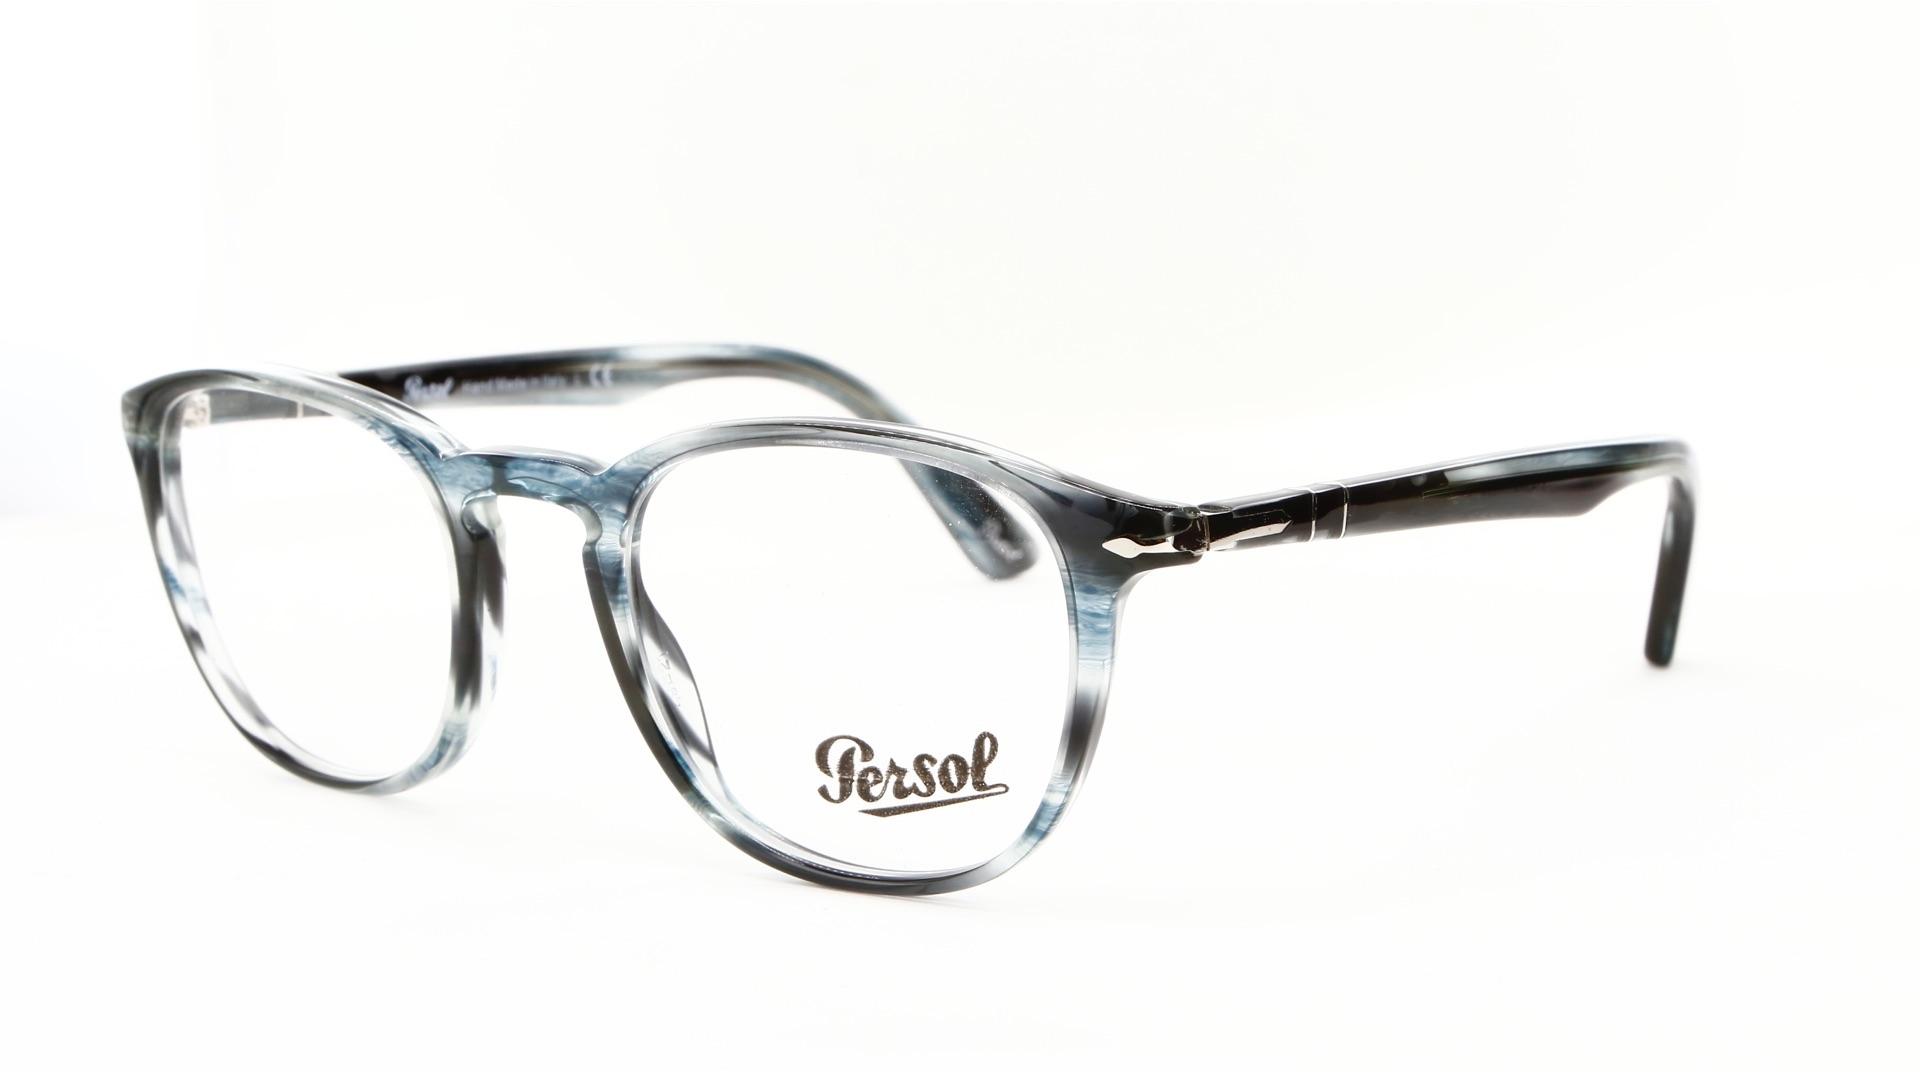 946a3228168cd Persol frames - ref  80787. Persol - ref  80787